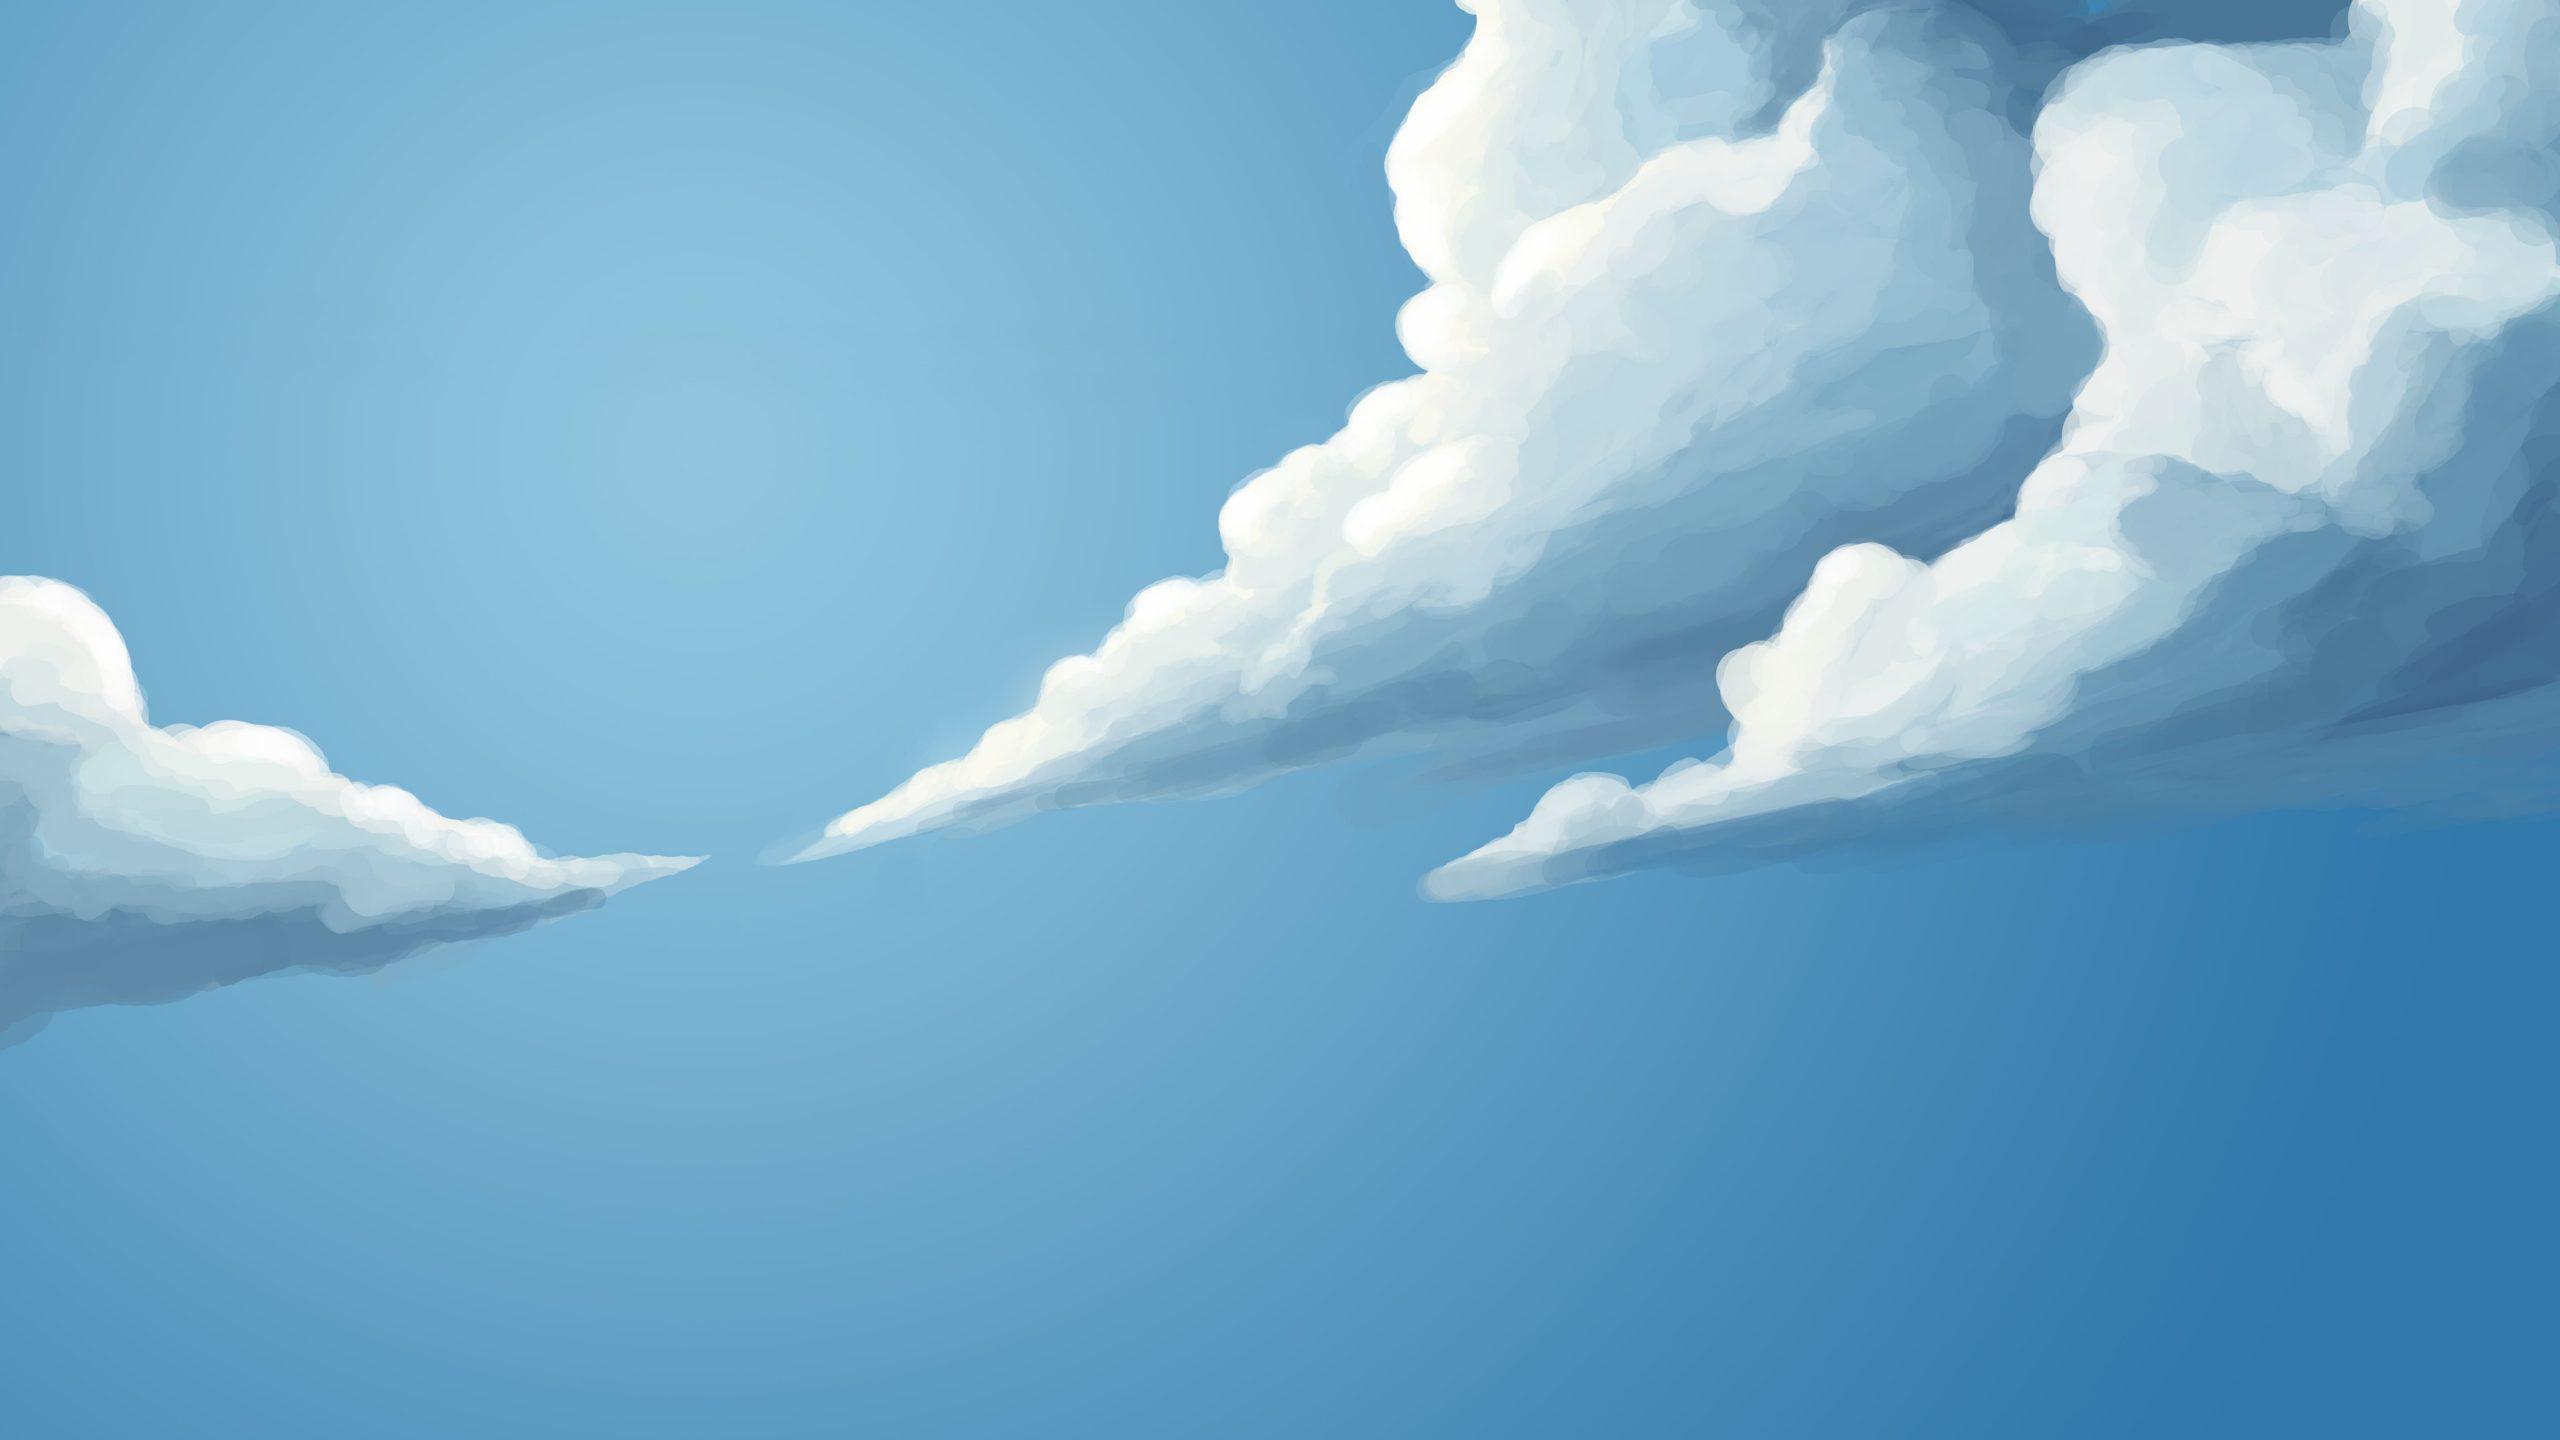 Anime Cloud HD Download